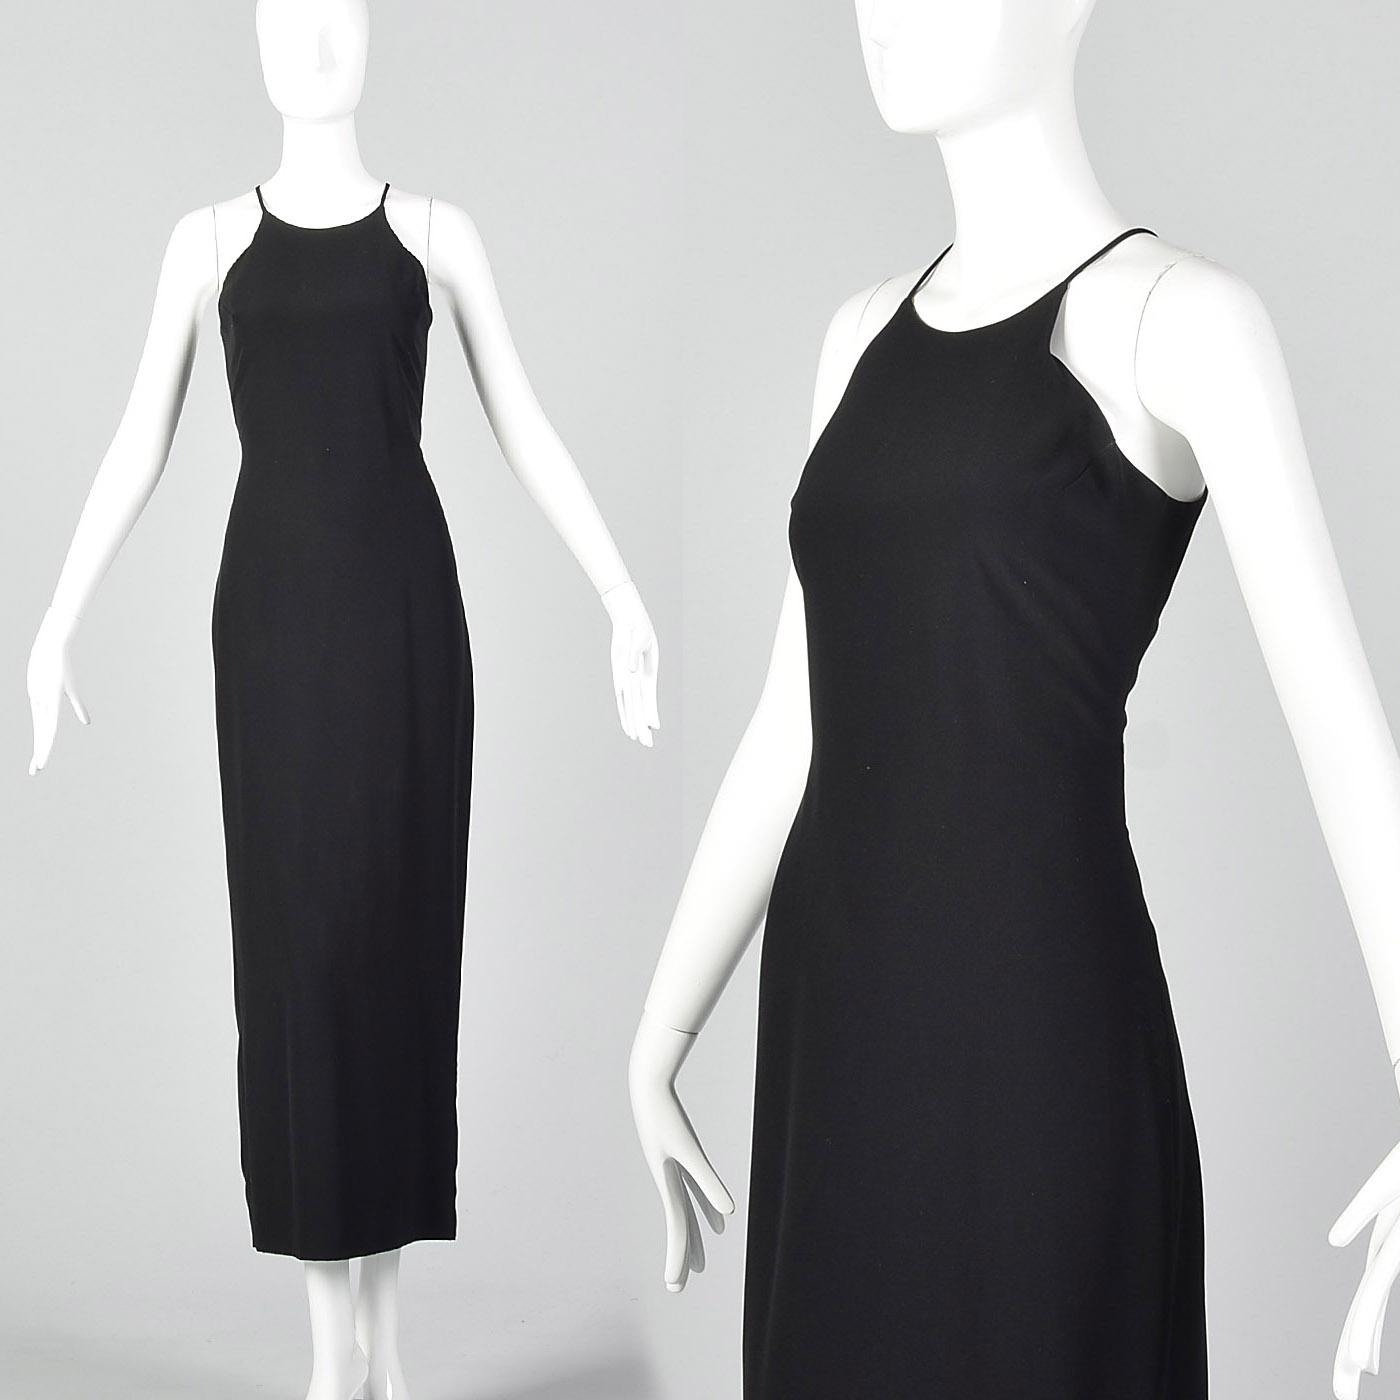 Goth Dress  90s Clothing  90s Dress  90s Goth  Rhinestone  Cocktail Dress  Mini Dress  Vintage Prom Dress  Prom Dress  90s